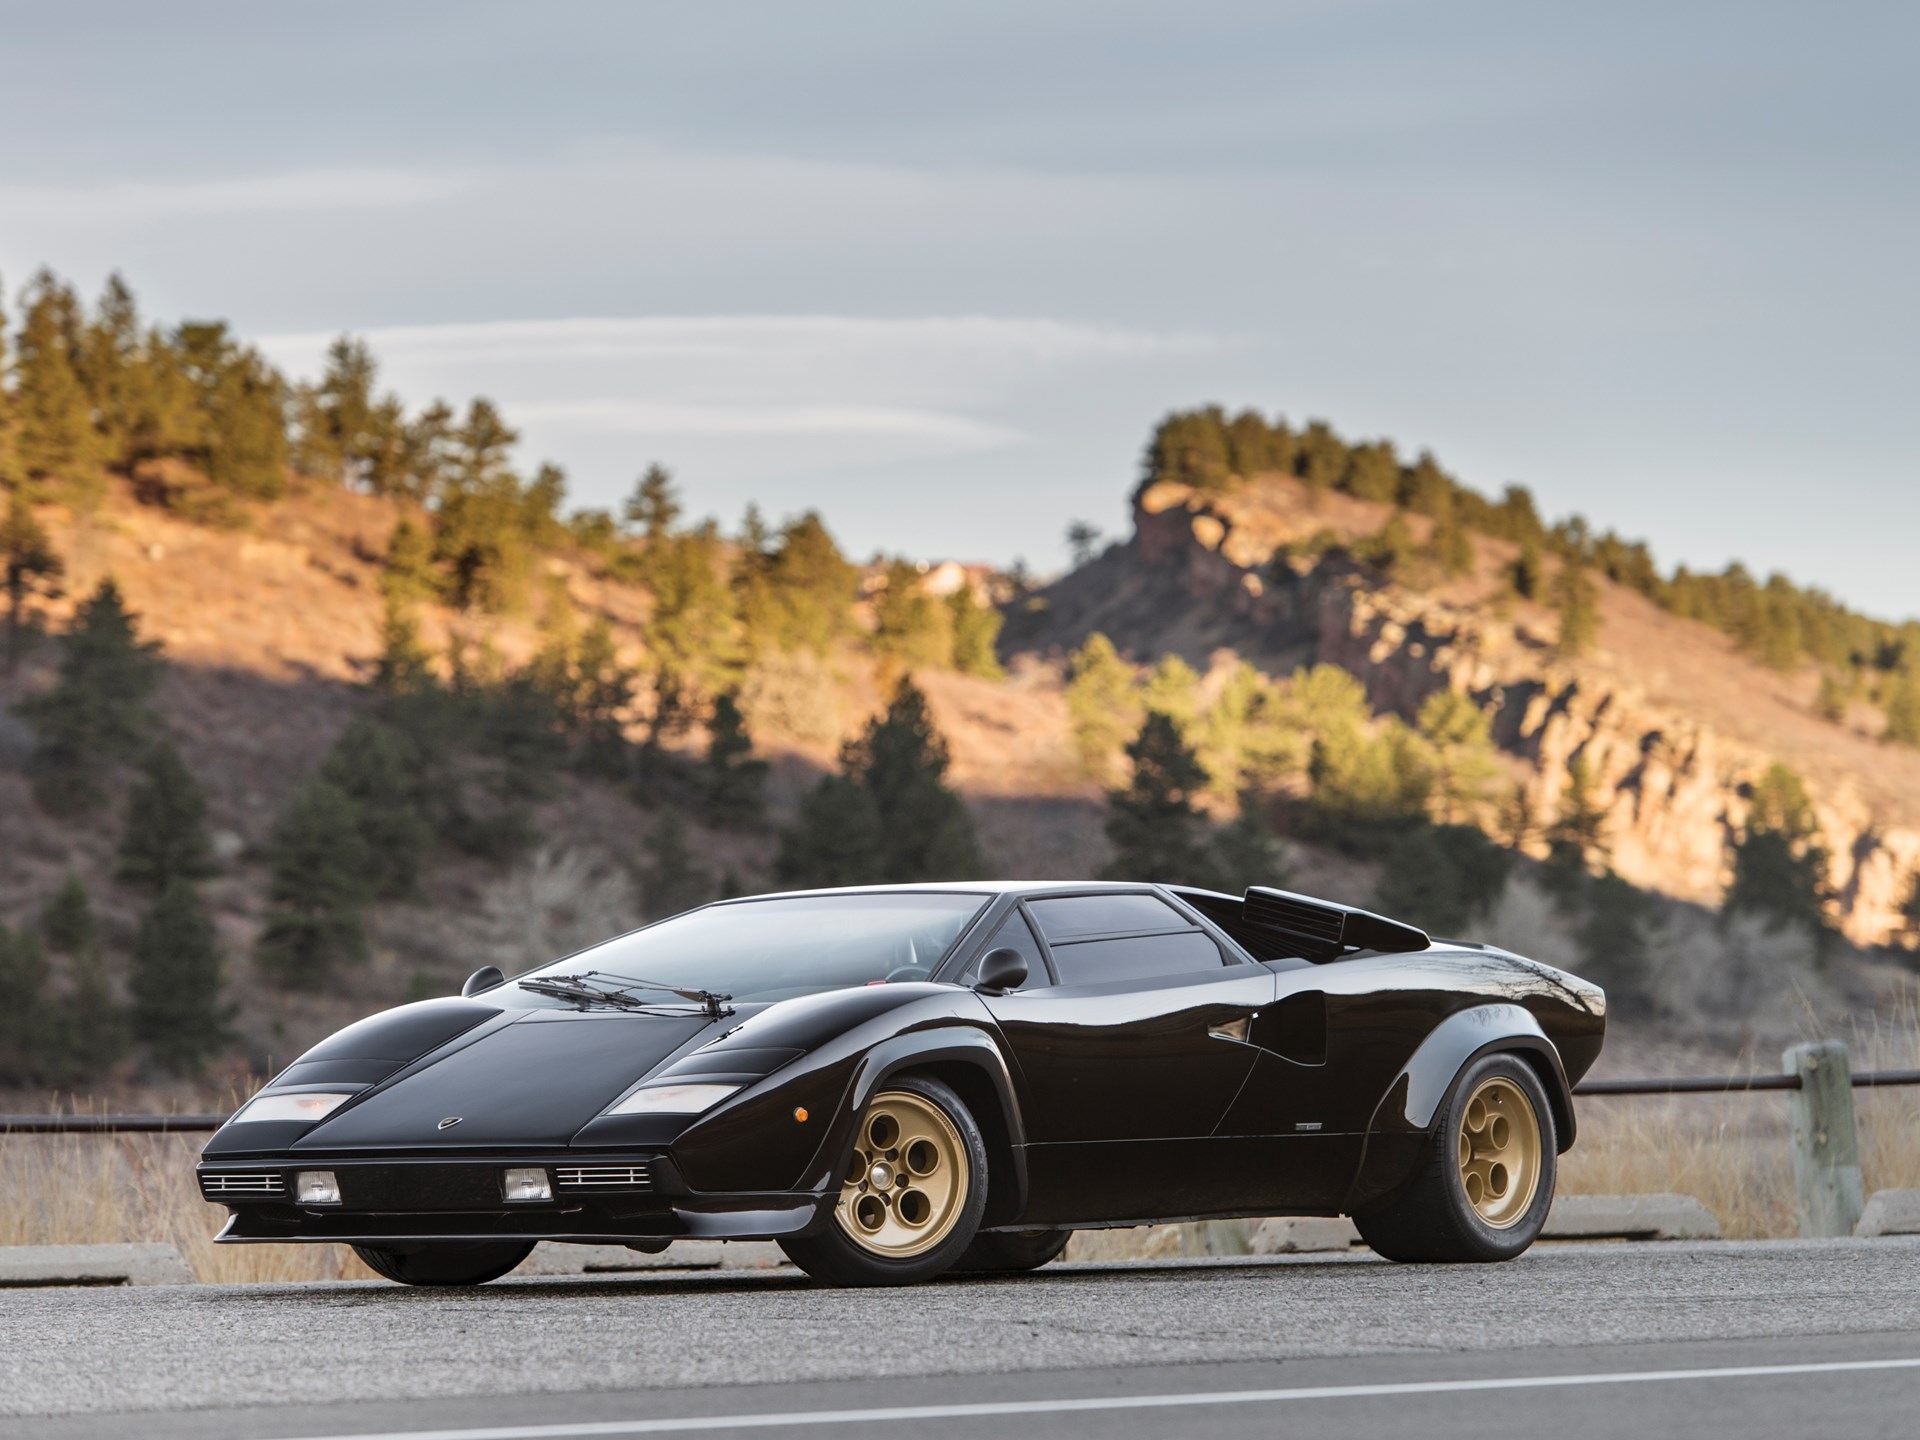 RM Sotheby's - 1979 Lamborghini Countach LP400 S Series I by Bertone ...